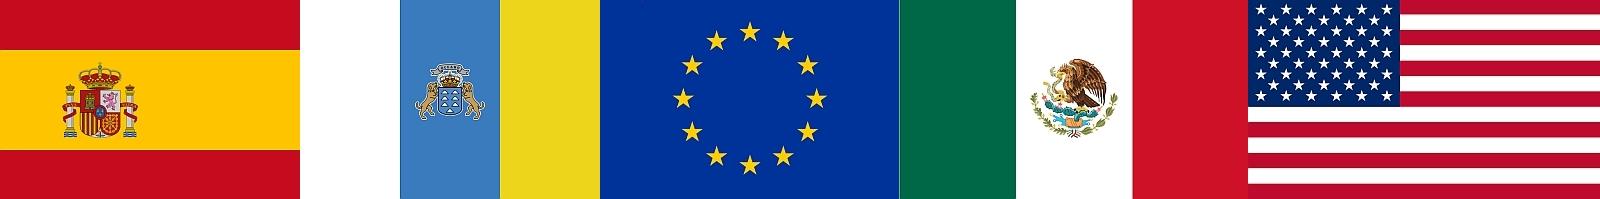 vlajky_gtc